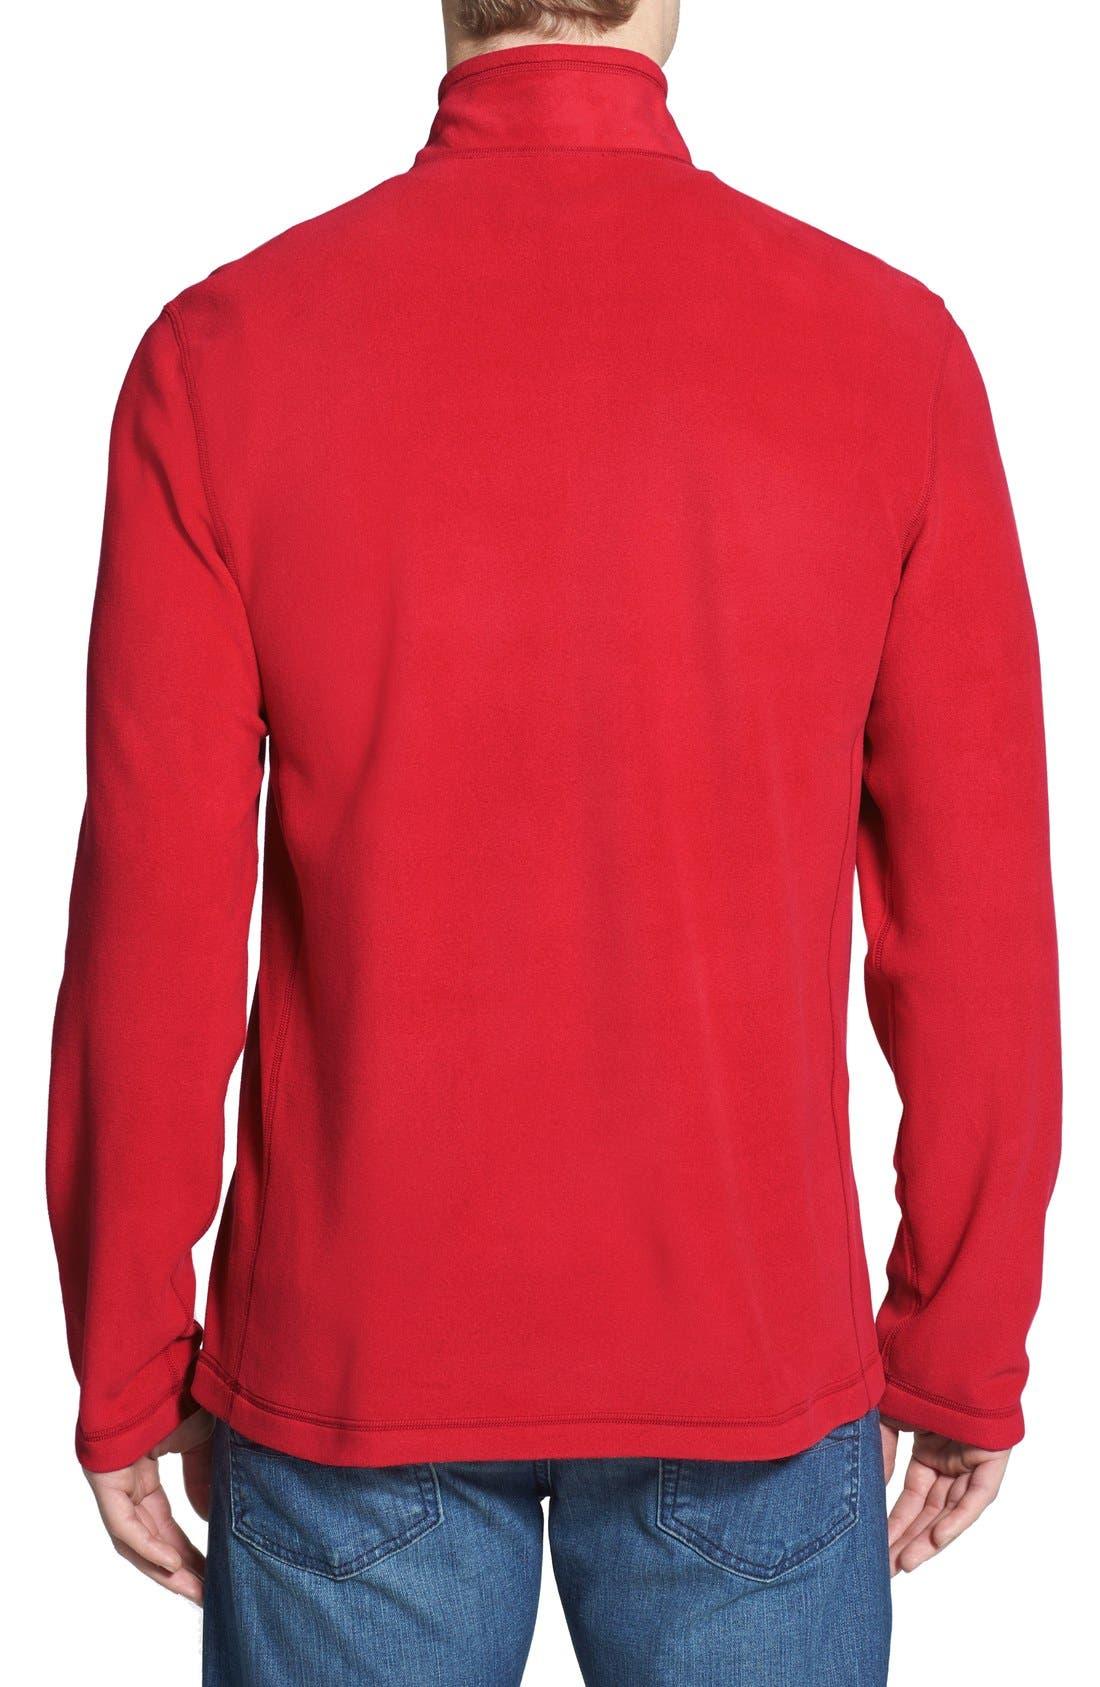 'TKA 100 Glacier' Quarter Zip Fleece Pullover,                             Alternate thumbnail 144, color,